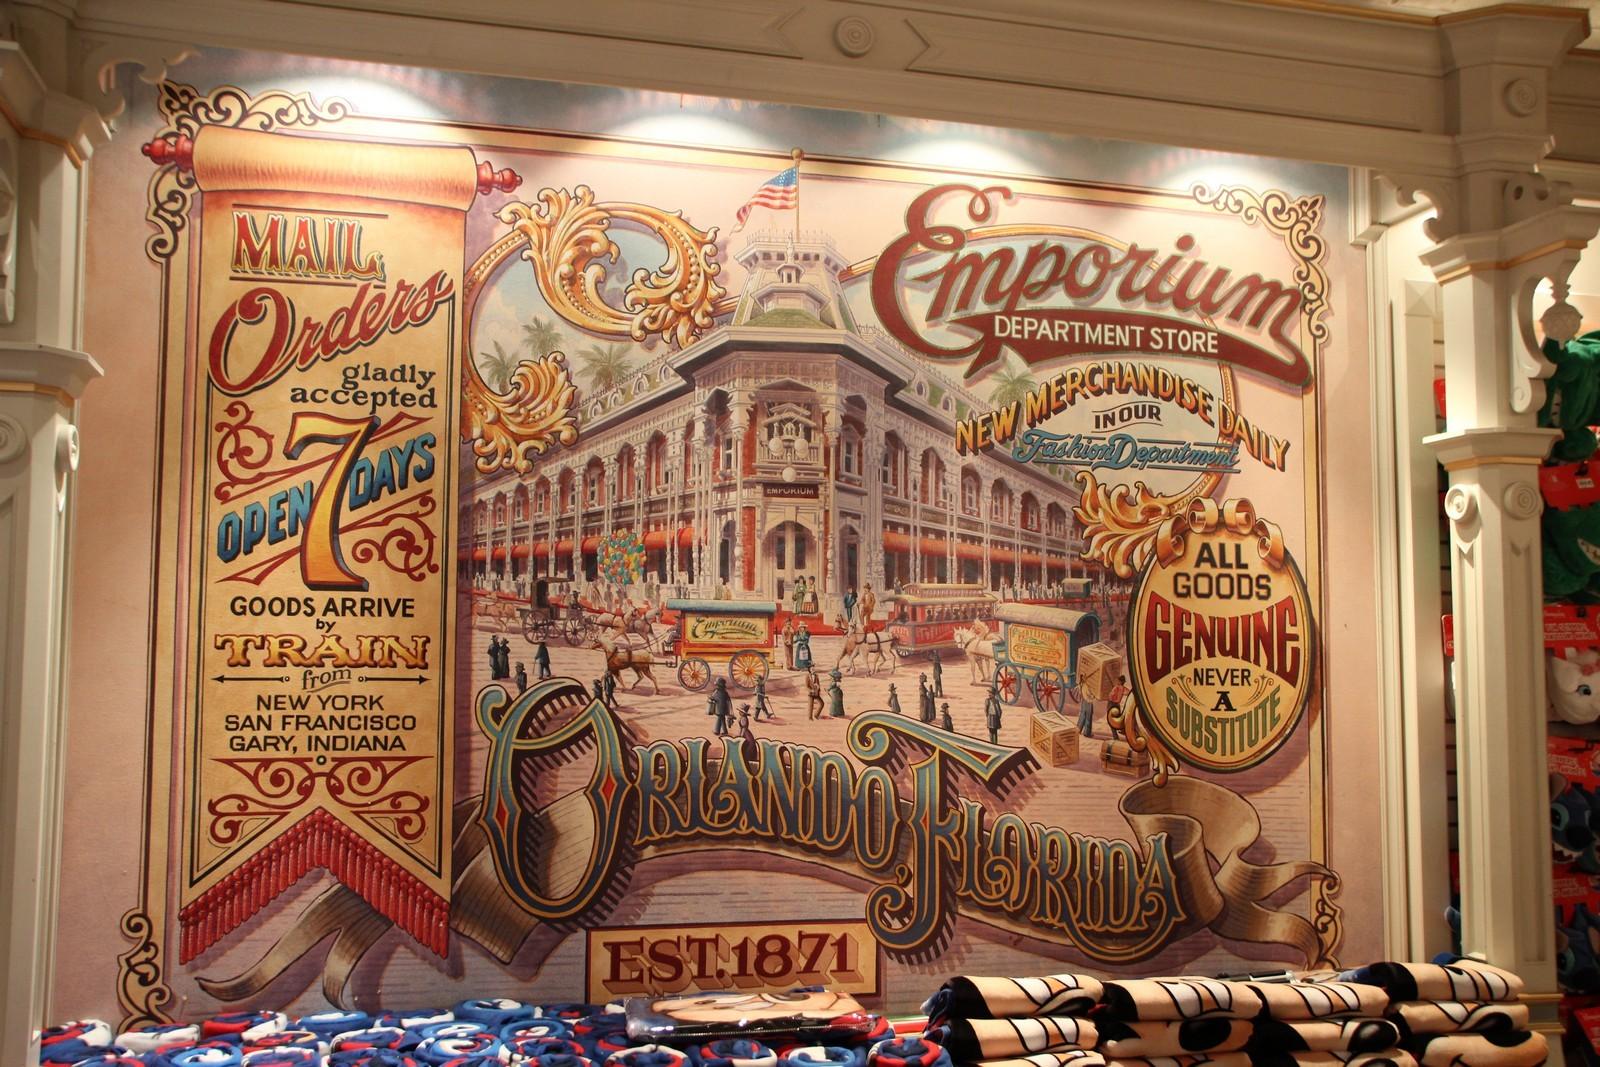 2020 - estensione della boutique Emporium Img_8711